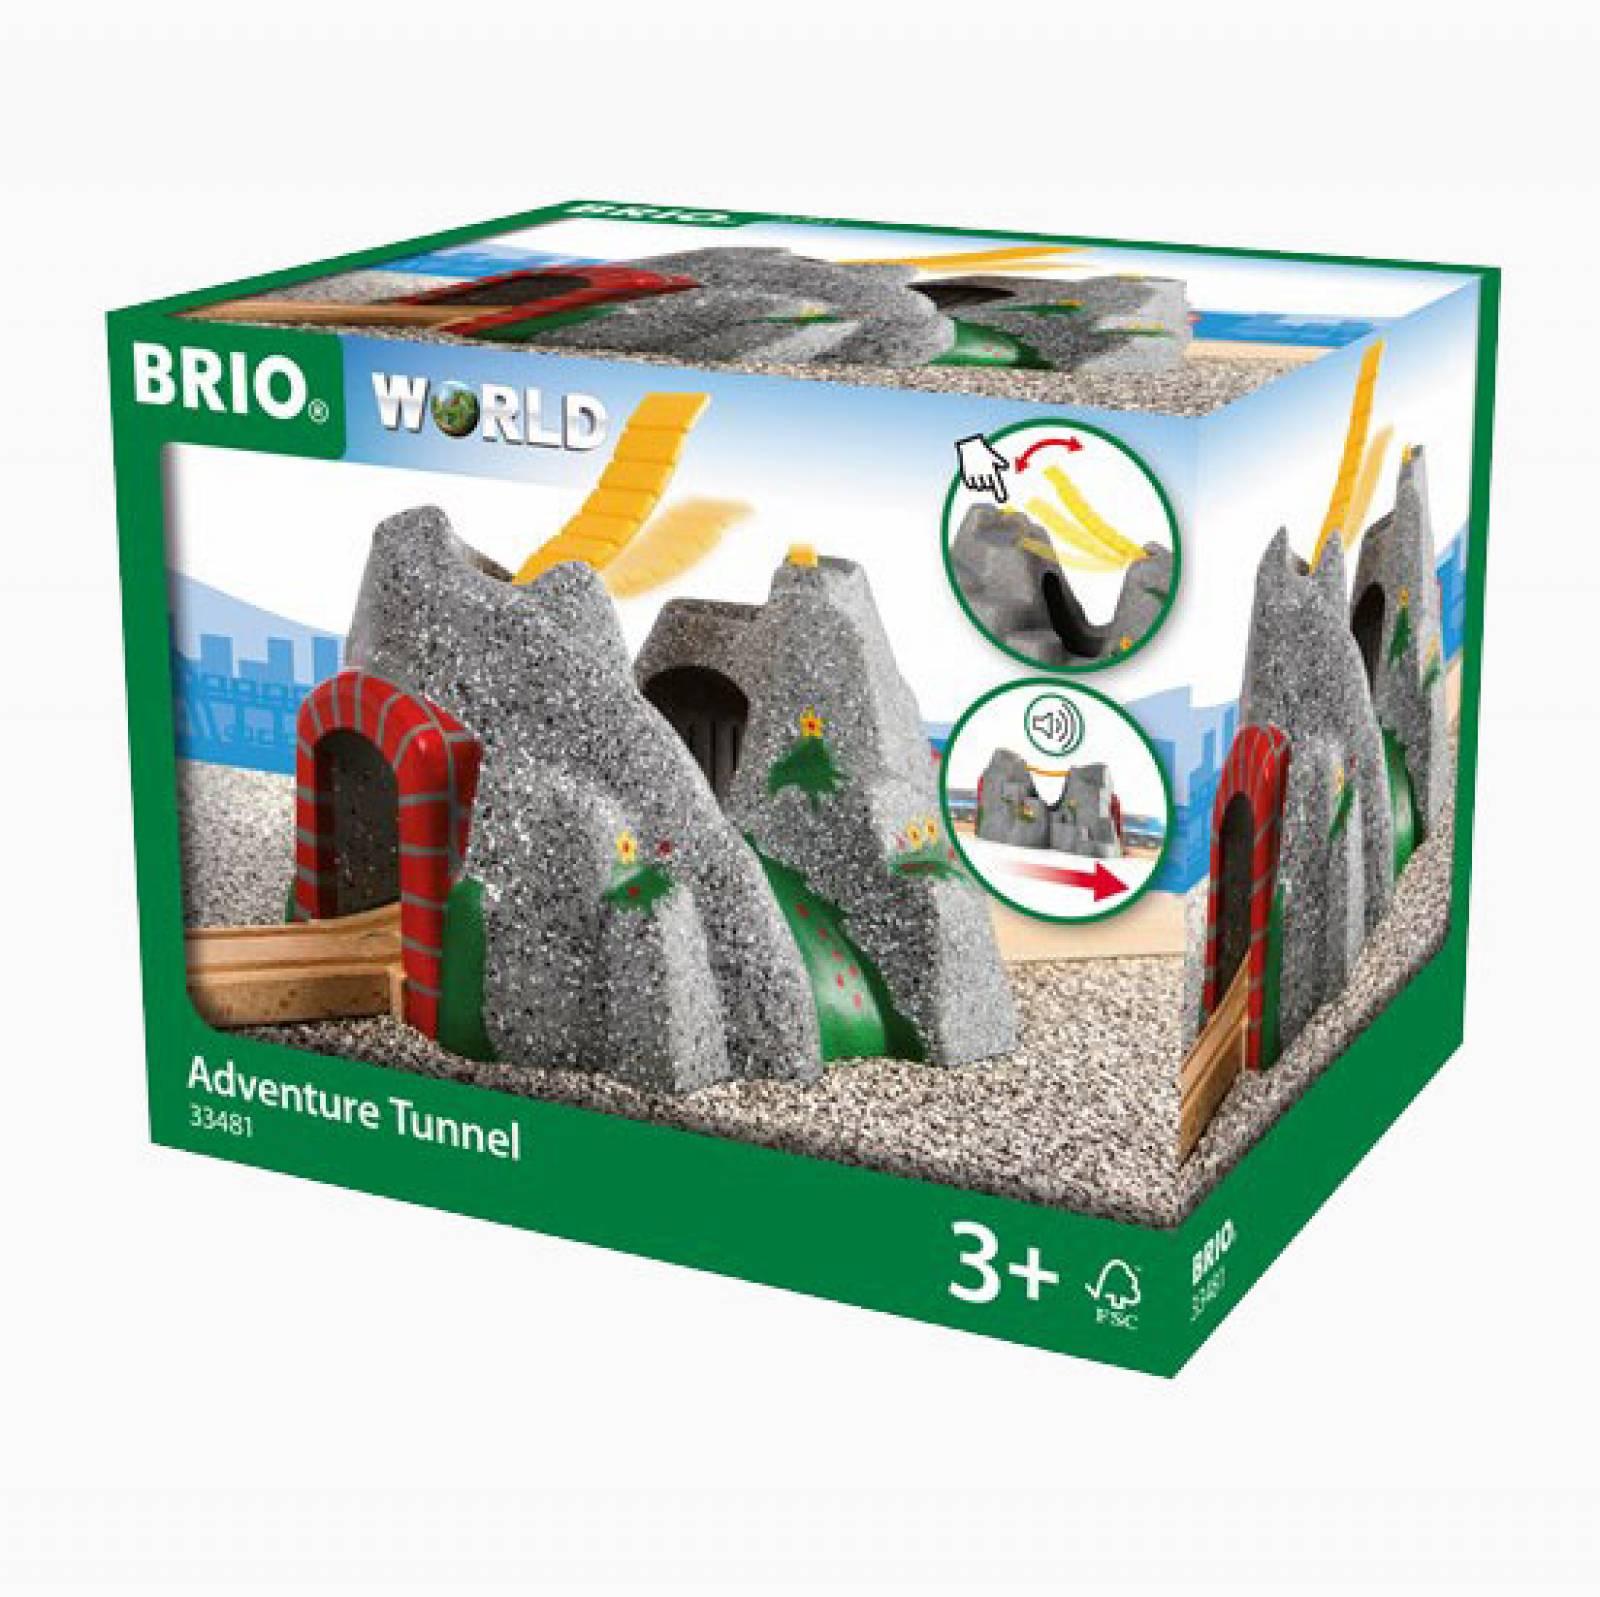 Adventure Tunnel BRIO® Wooden Railway Age 3+ thumbnails